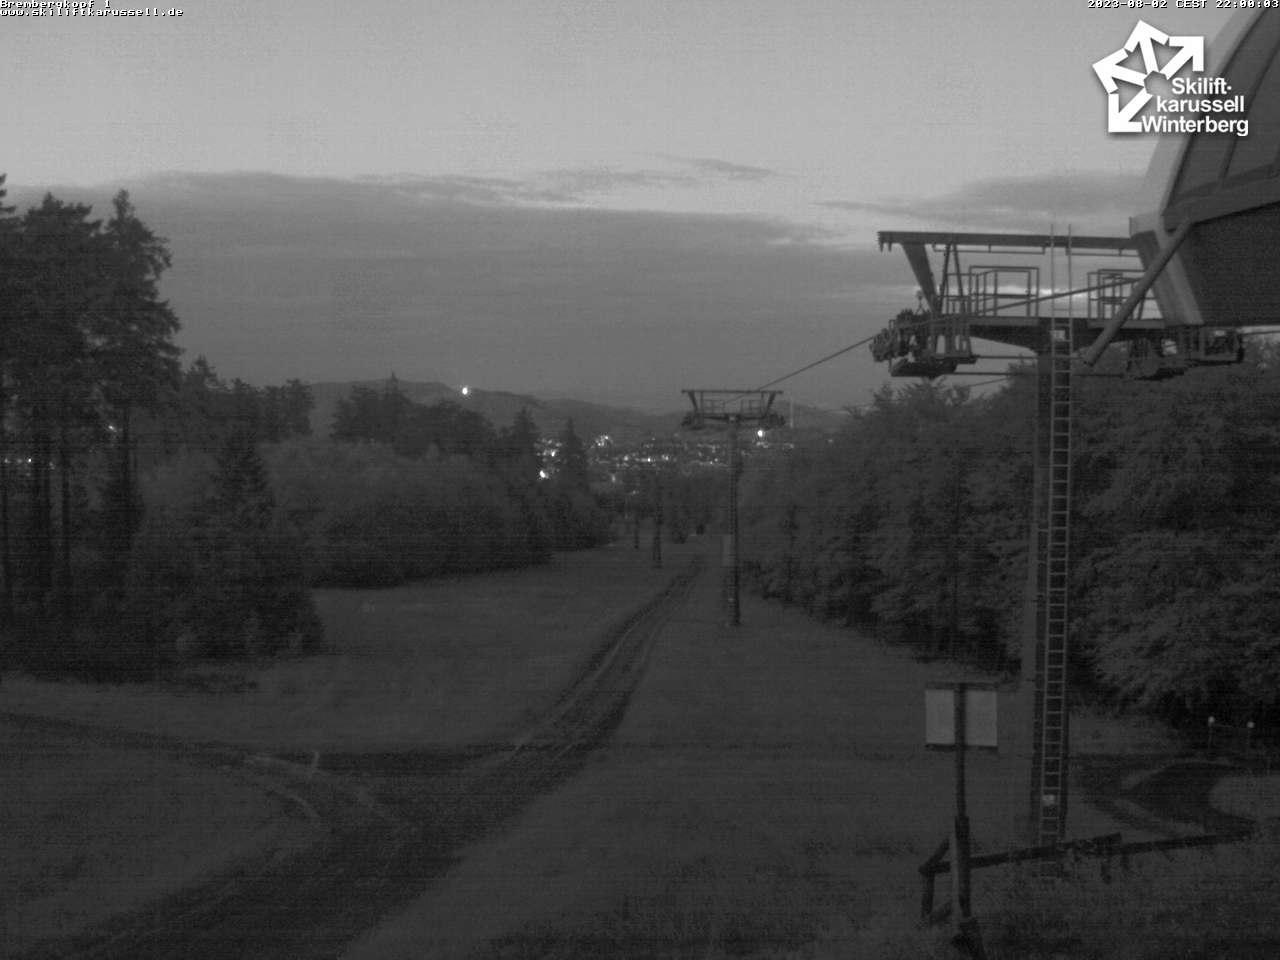 Webcam Brembergkopf I - Skiliftkarussell Winterberg